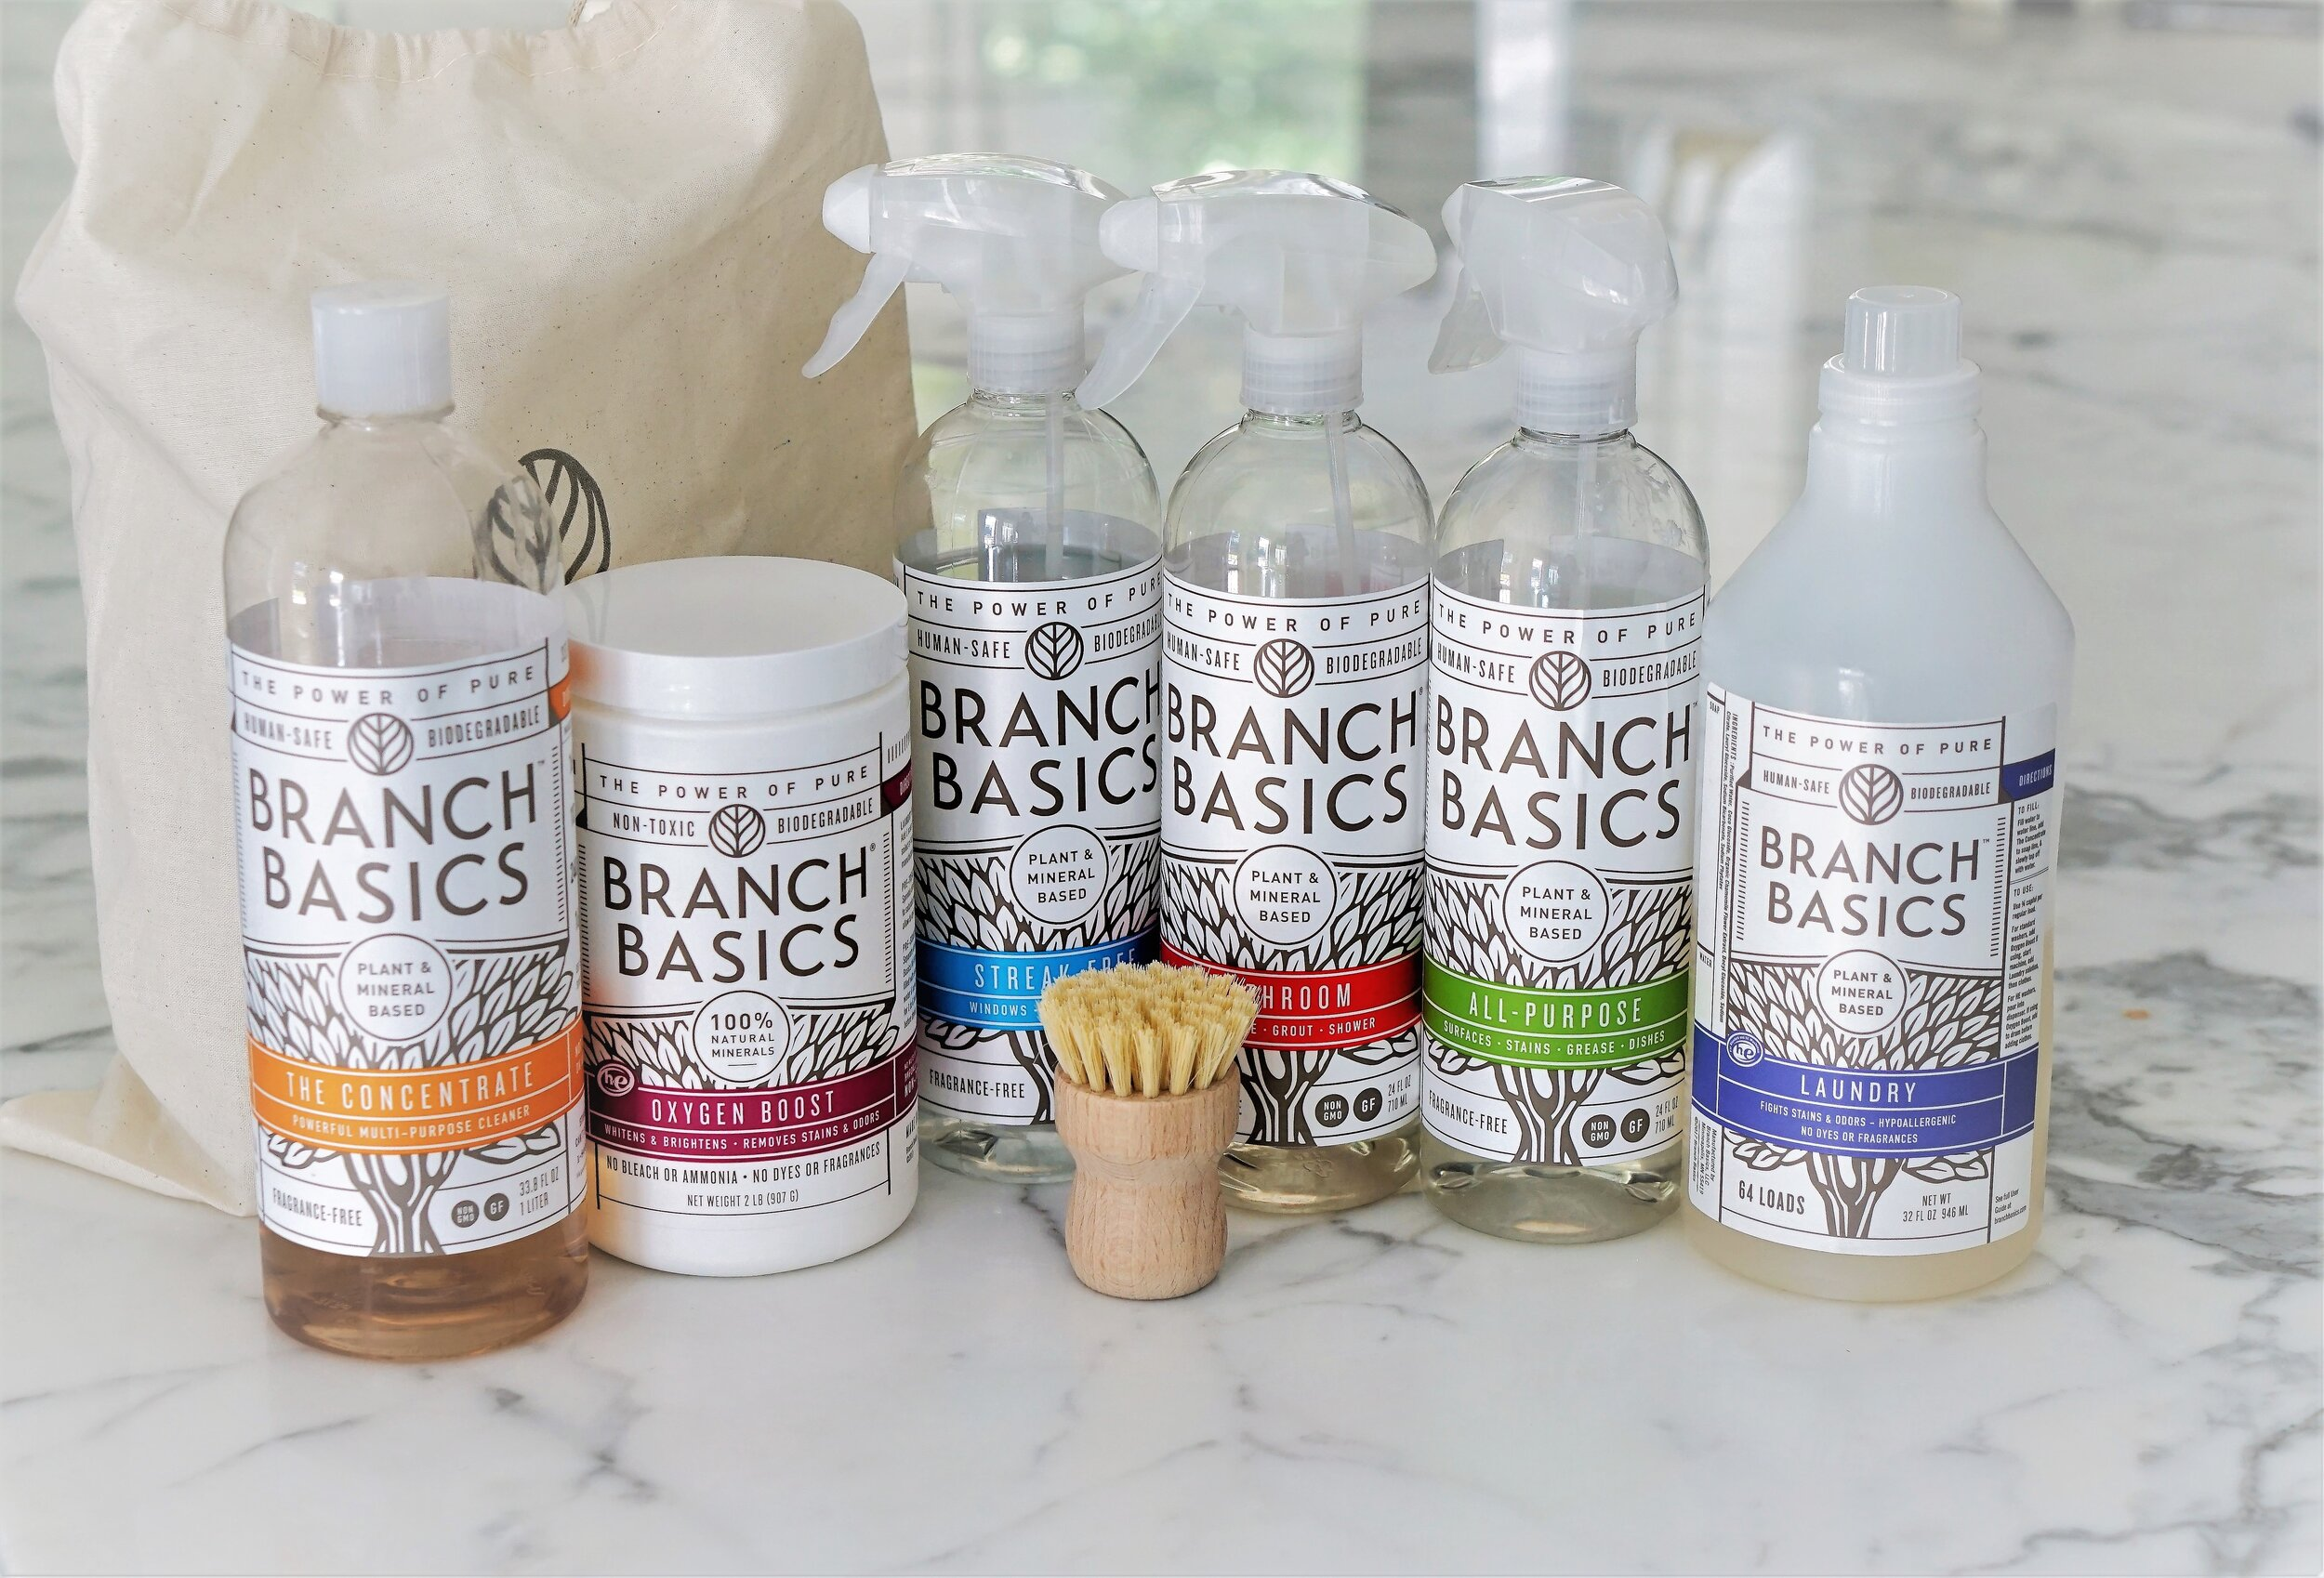 Branch basics products.JPG